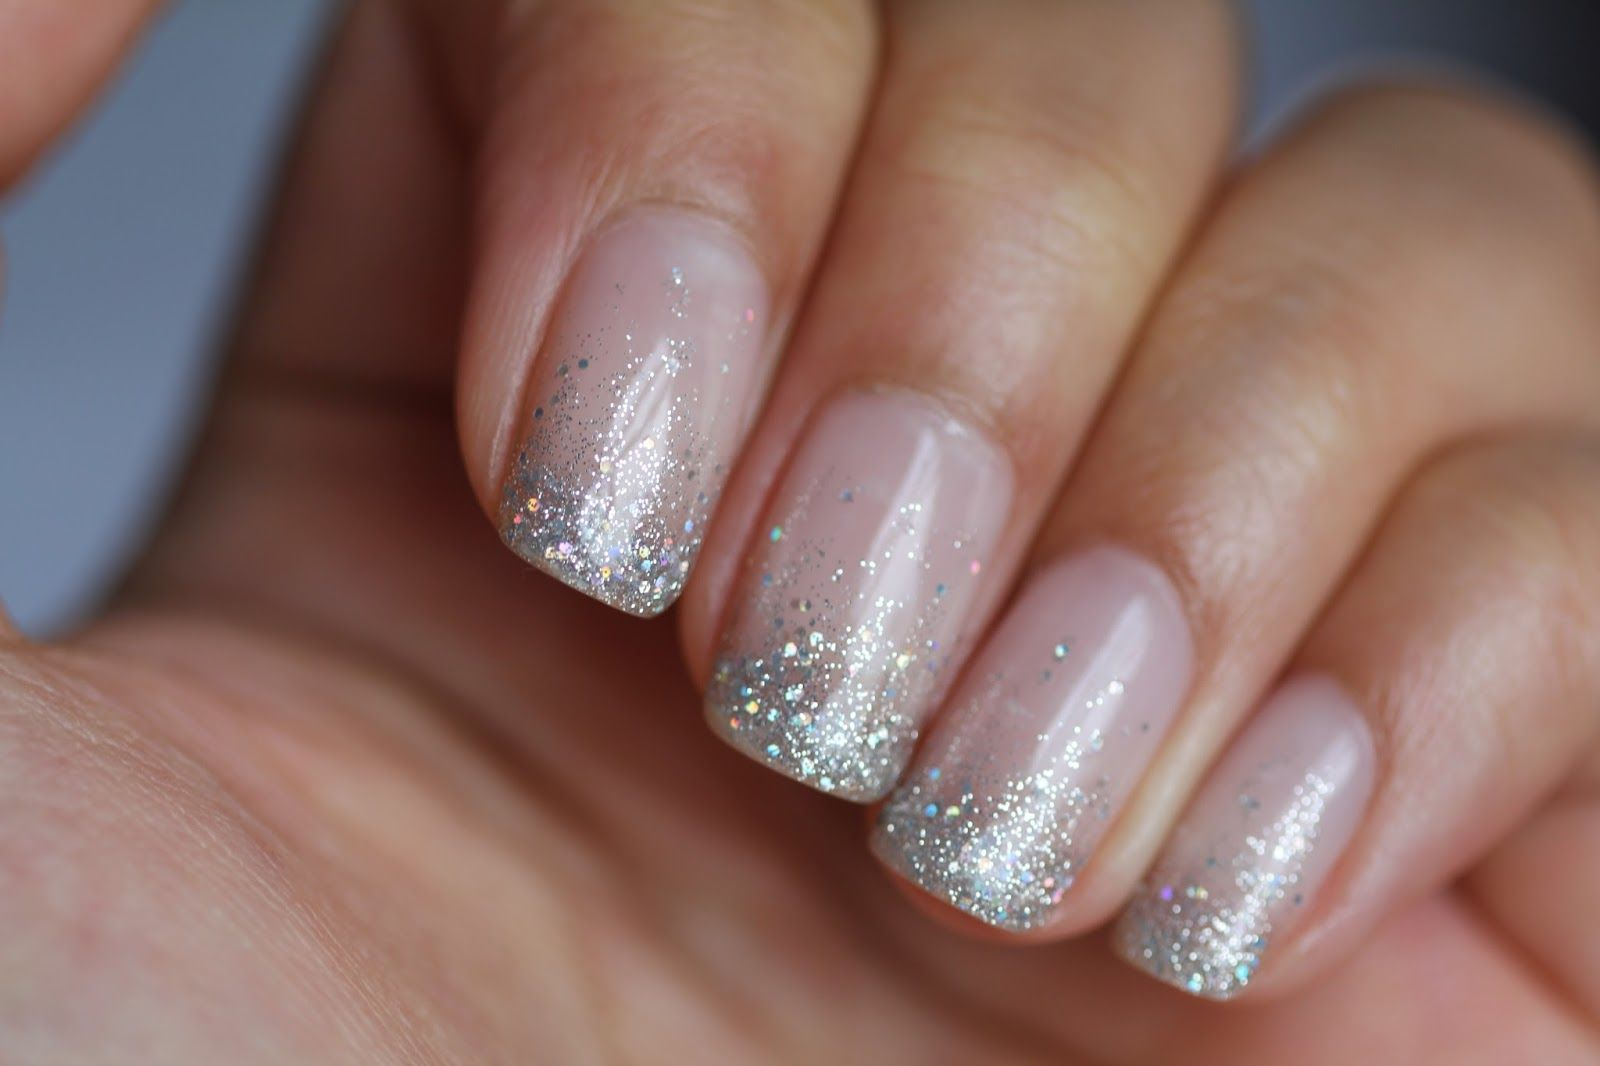 french shellac nails | Nails | Pinterest | Nägel, Nägel lackieren ...